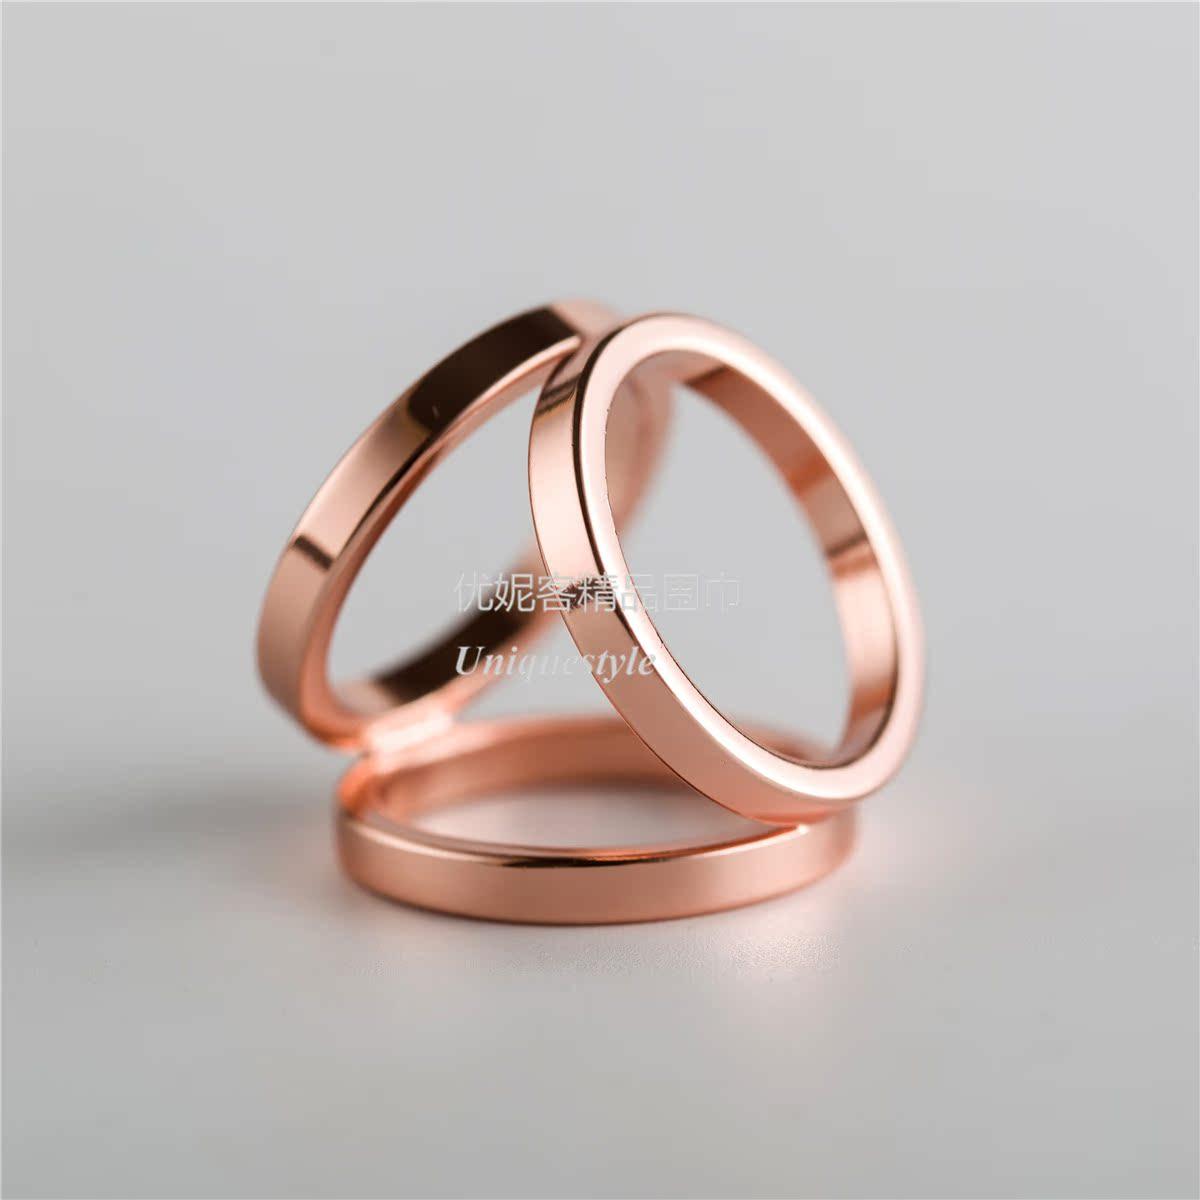 Цвет: Три кольца розовое золото 2.4